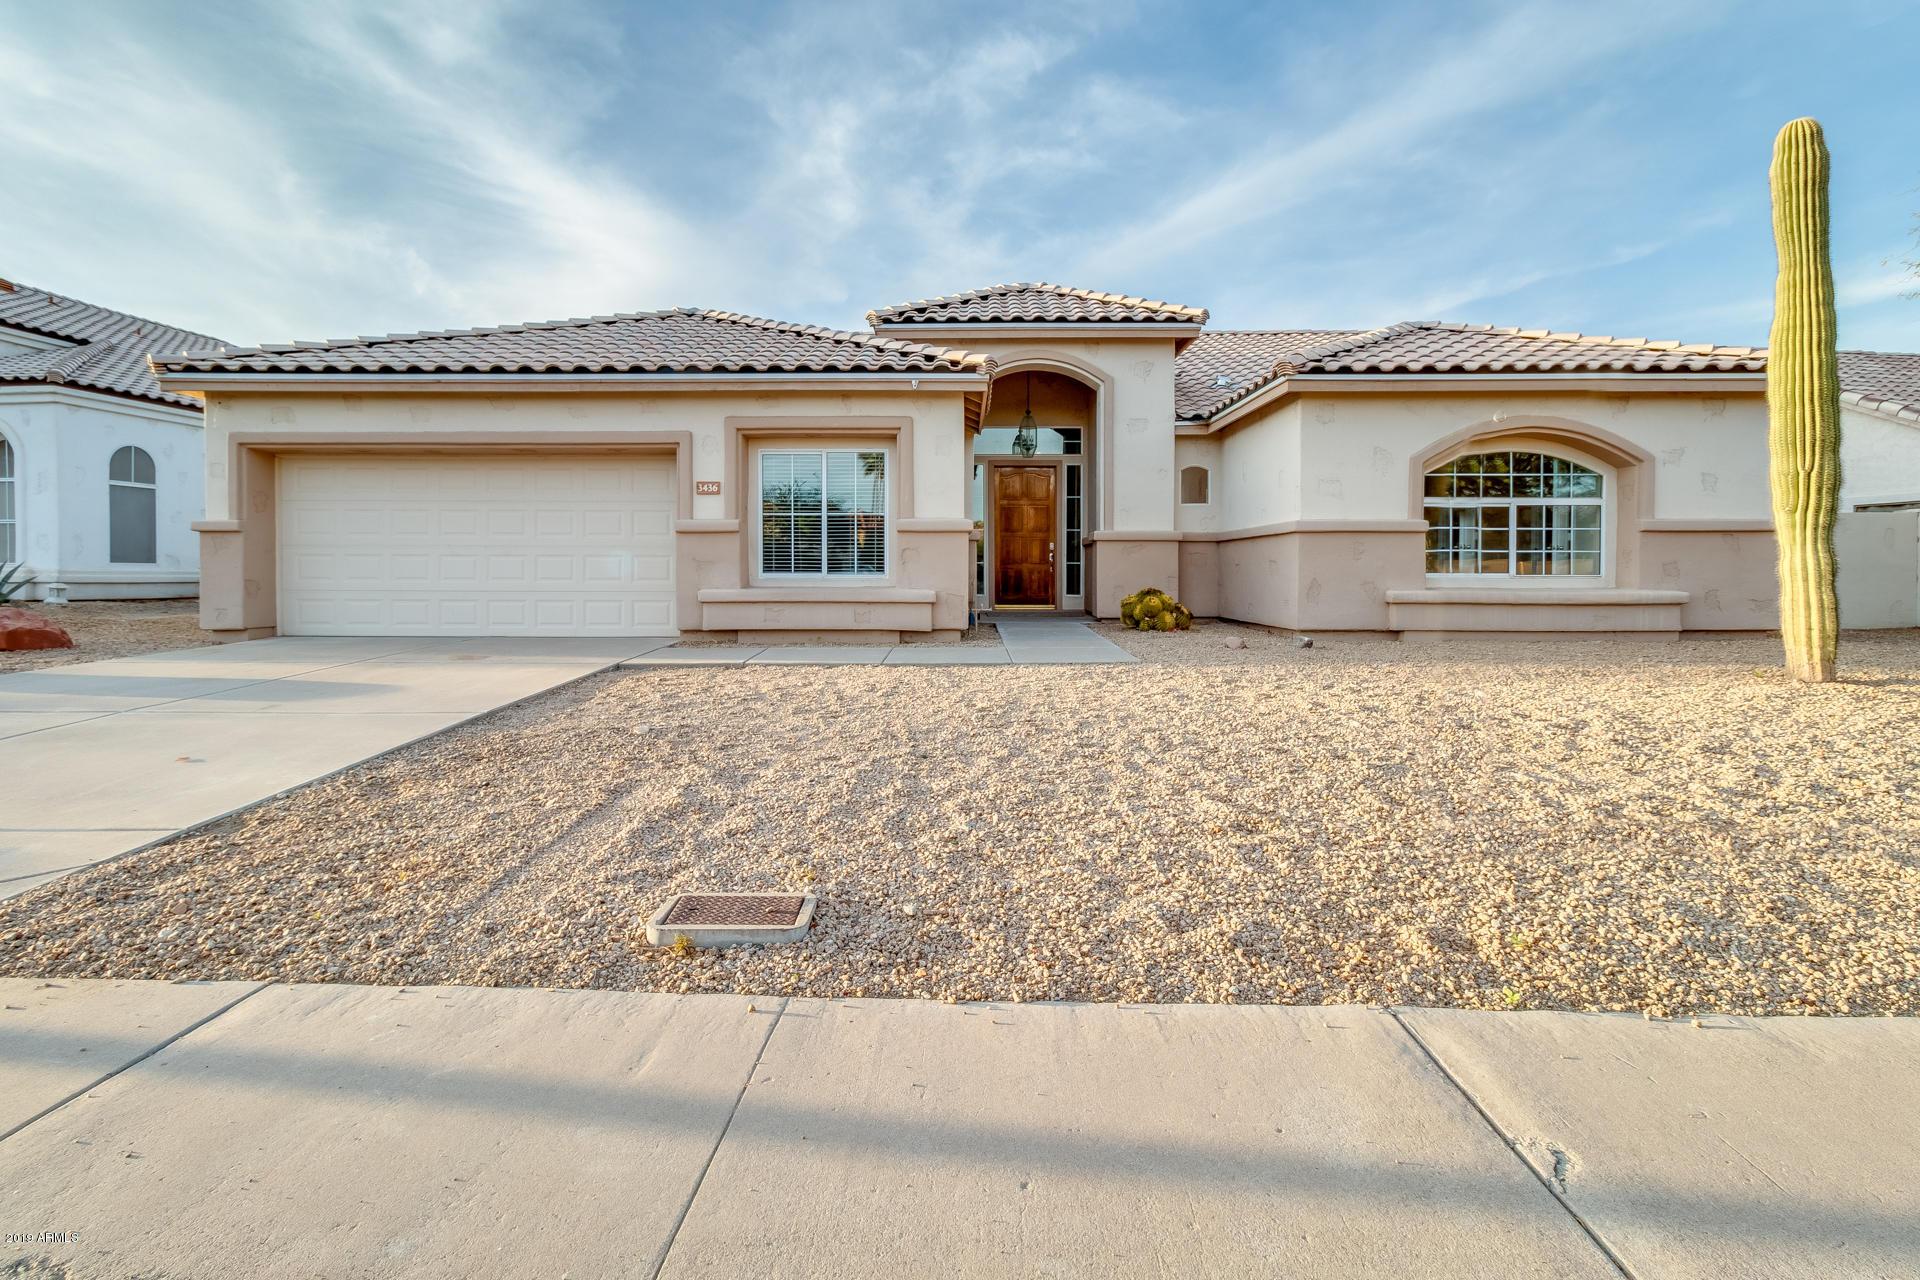 Photo of 3436 E ROCKY SLOPE Drive, Phoenix, AZ 85044